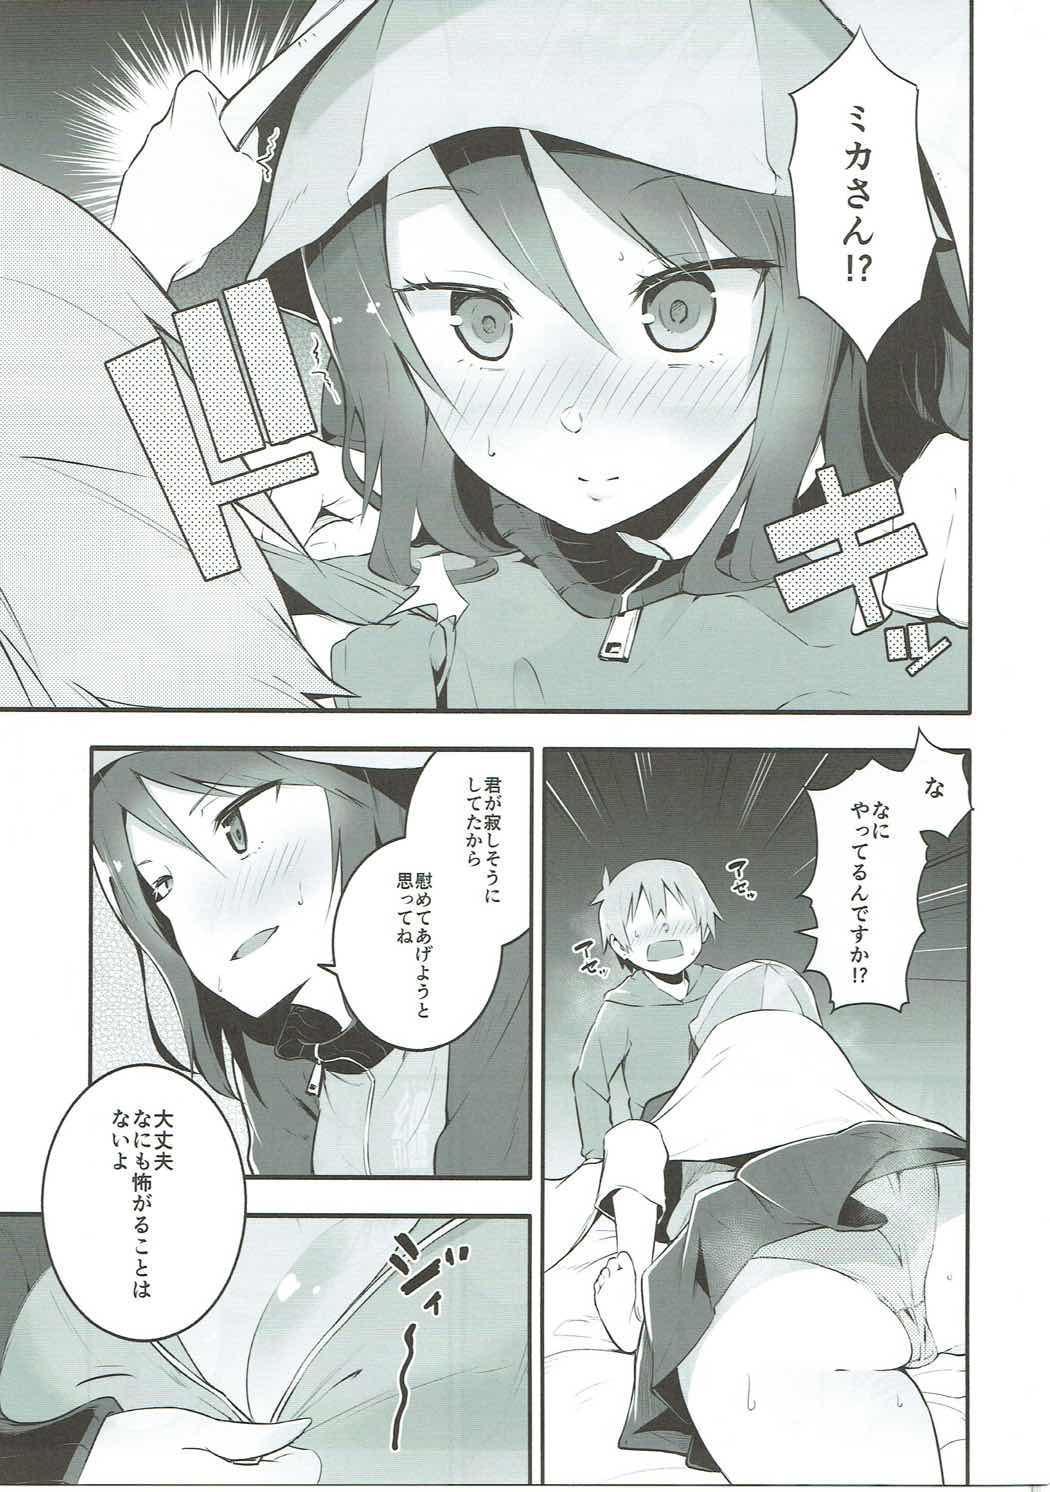 Mika-san to Ichaicha Mujintou Sakusen 3